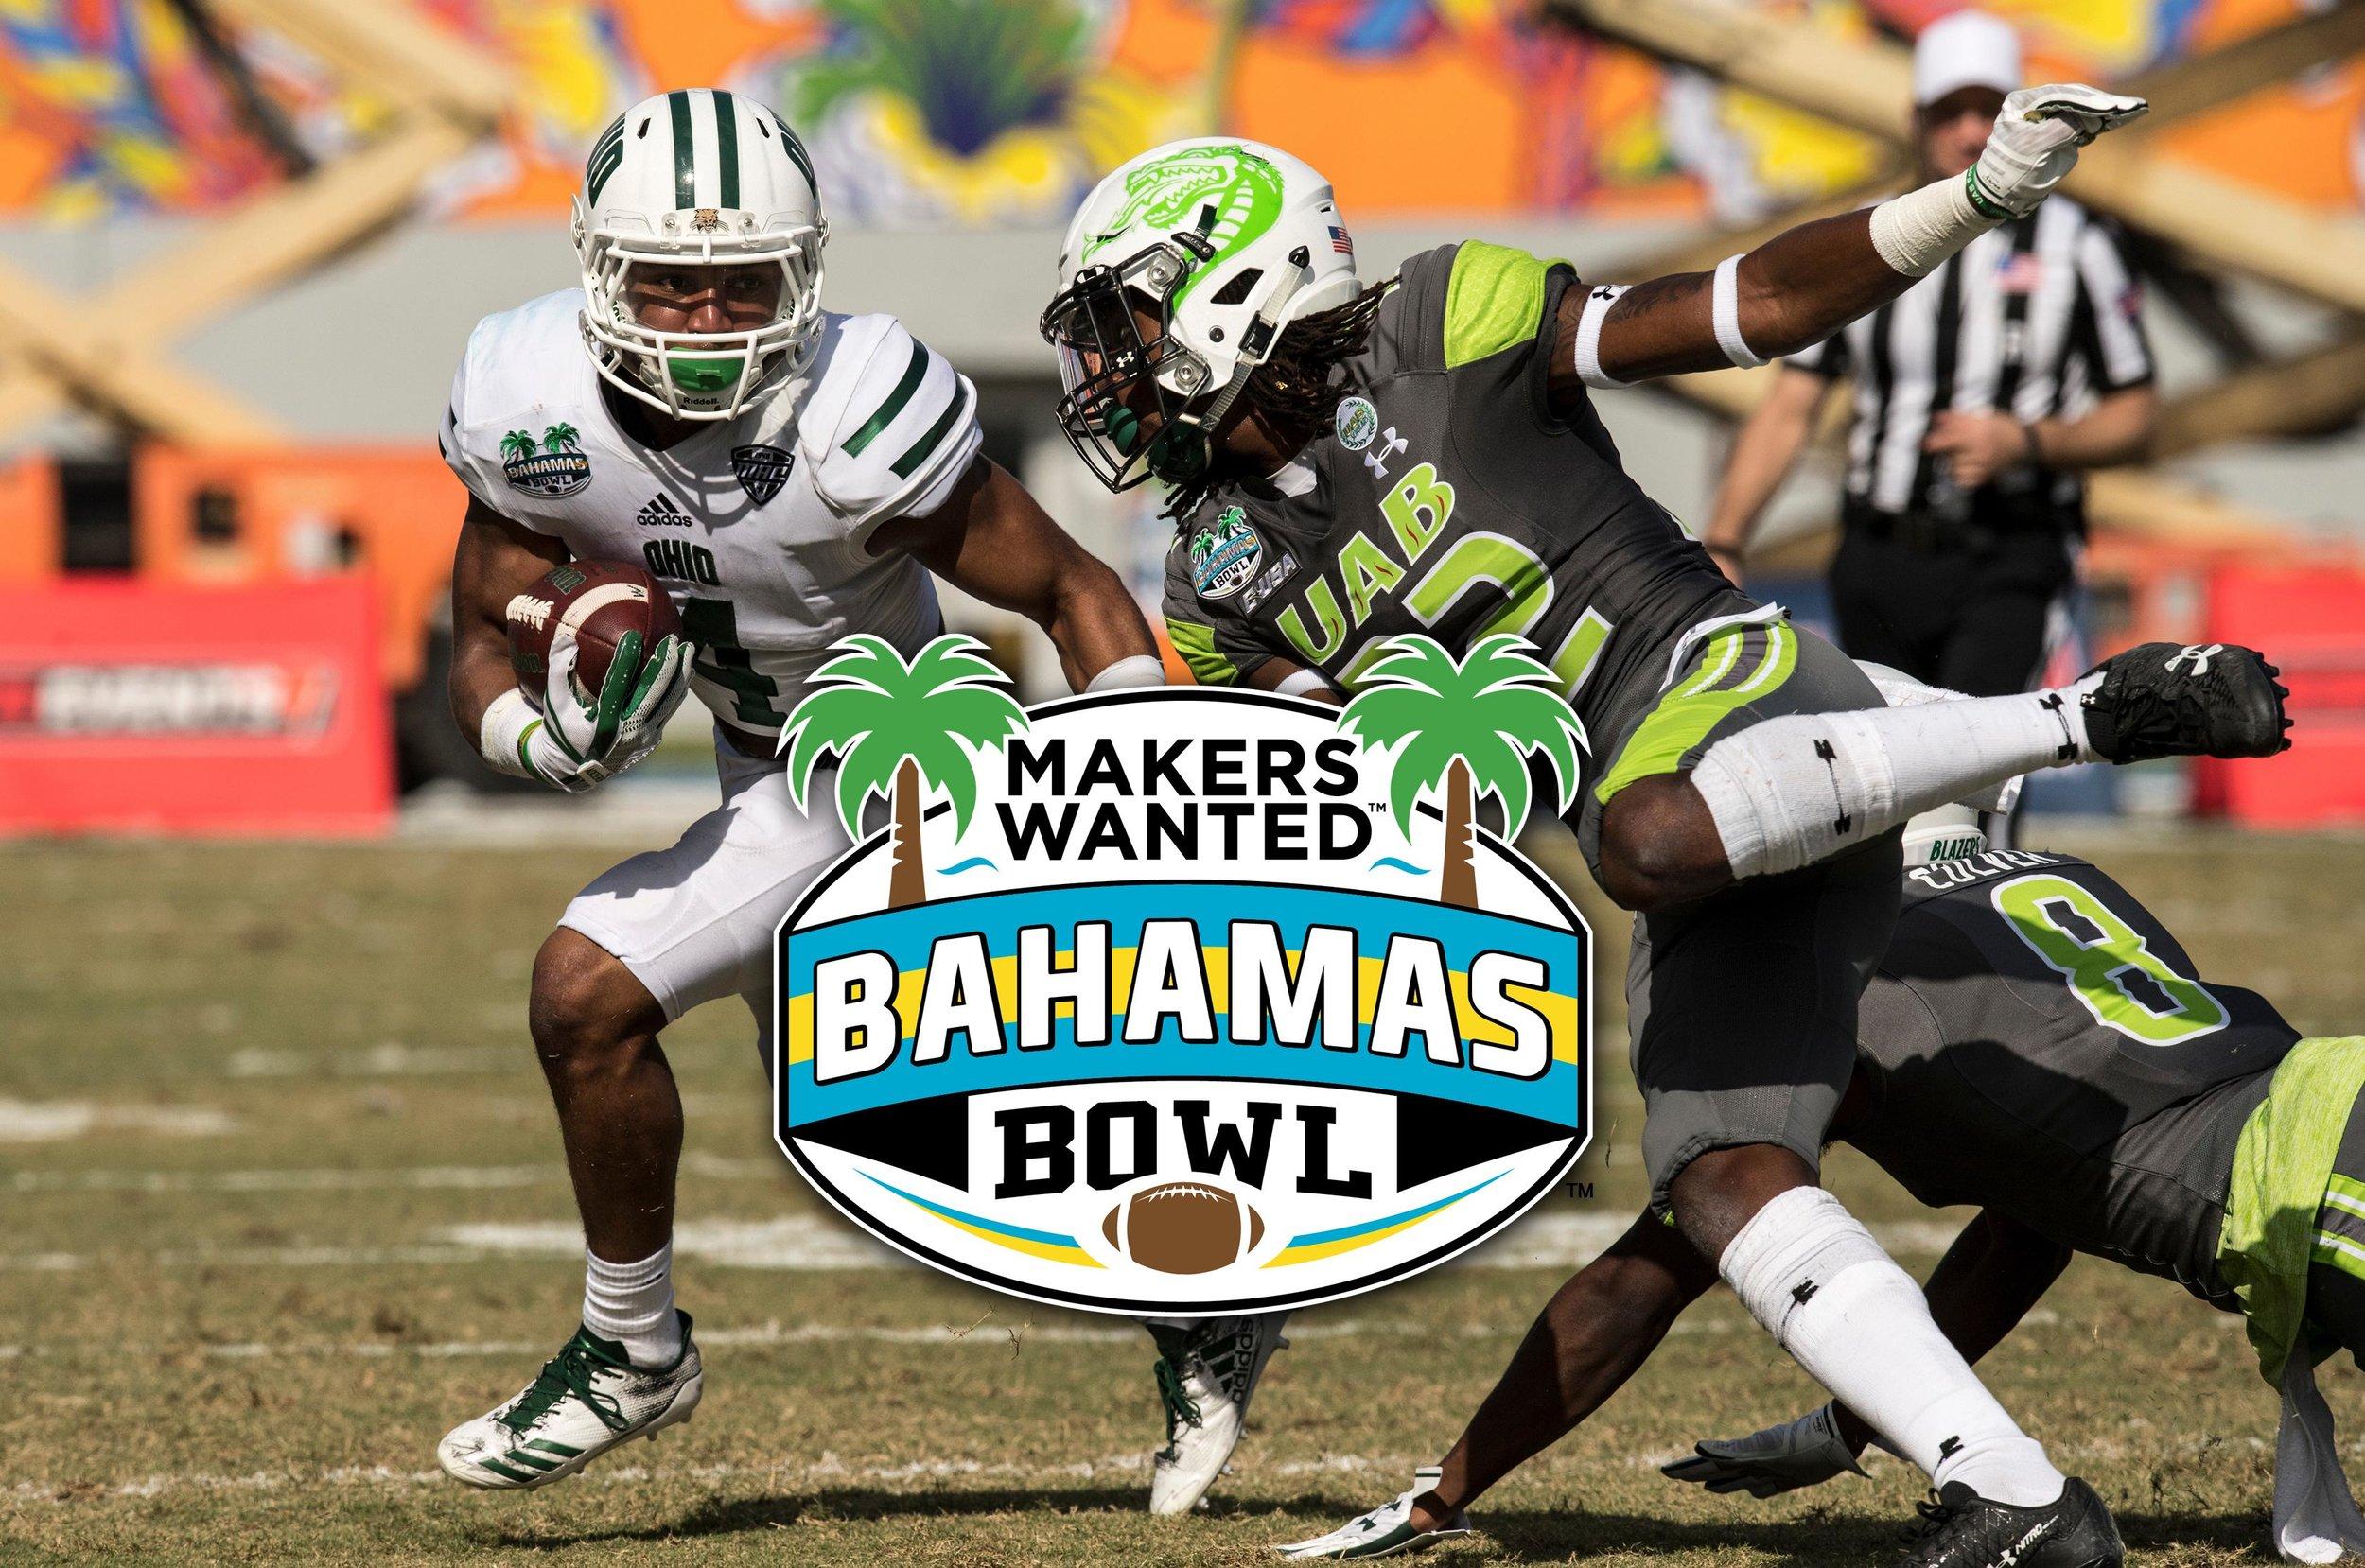 Impression Secures Elk Grove Village as Bahamas Bowl Title